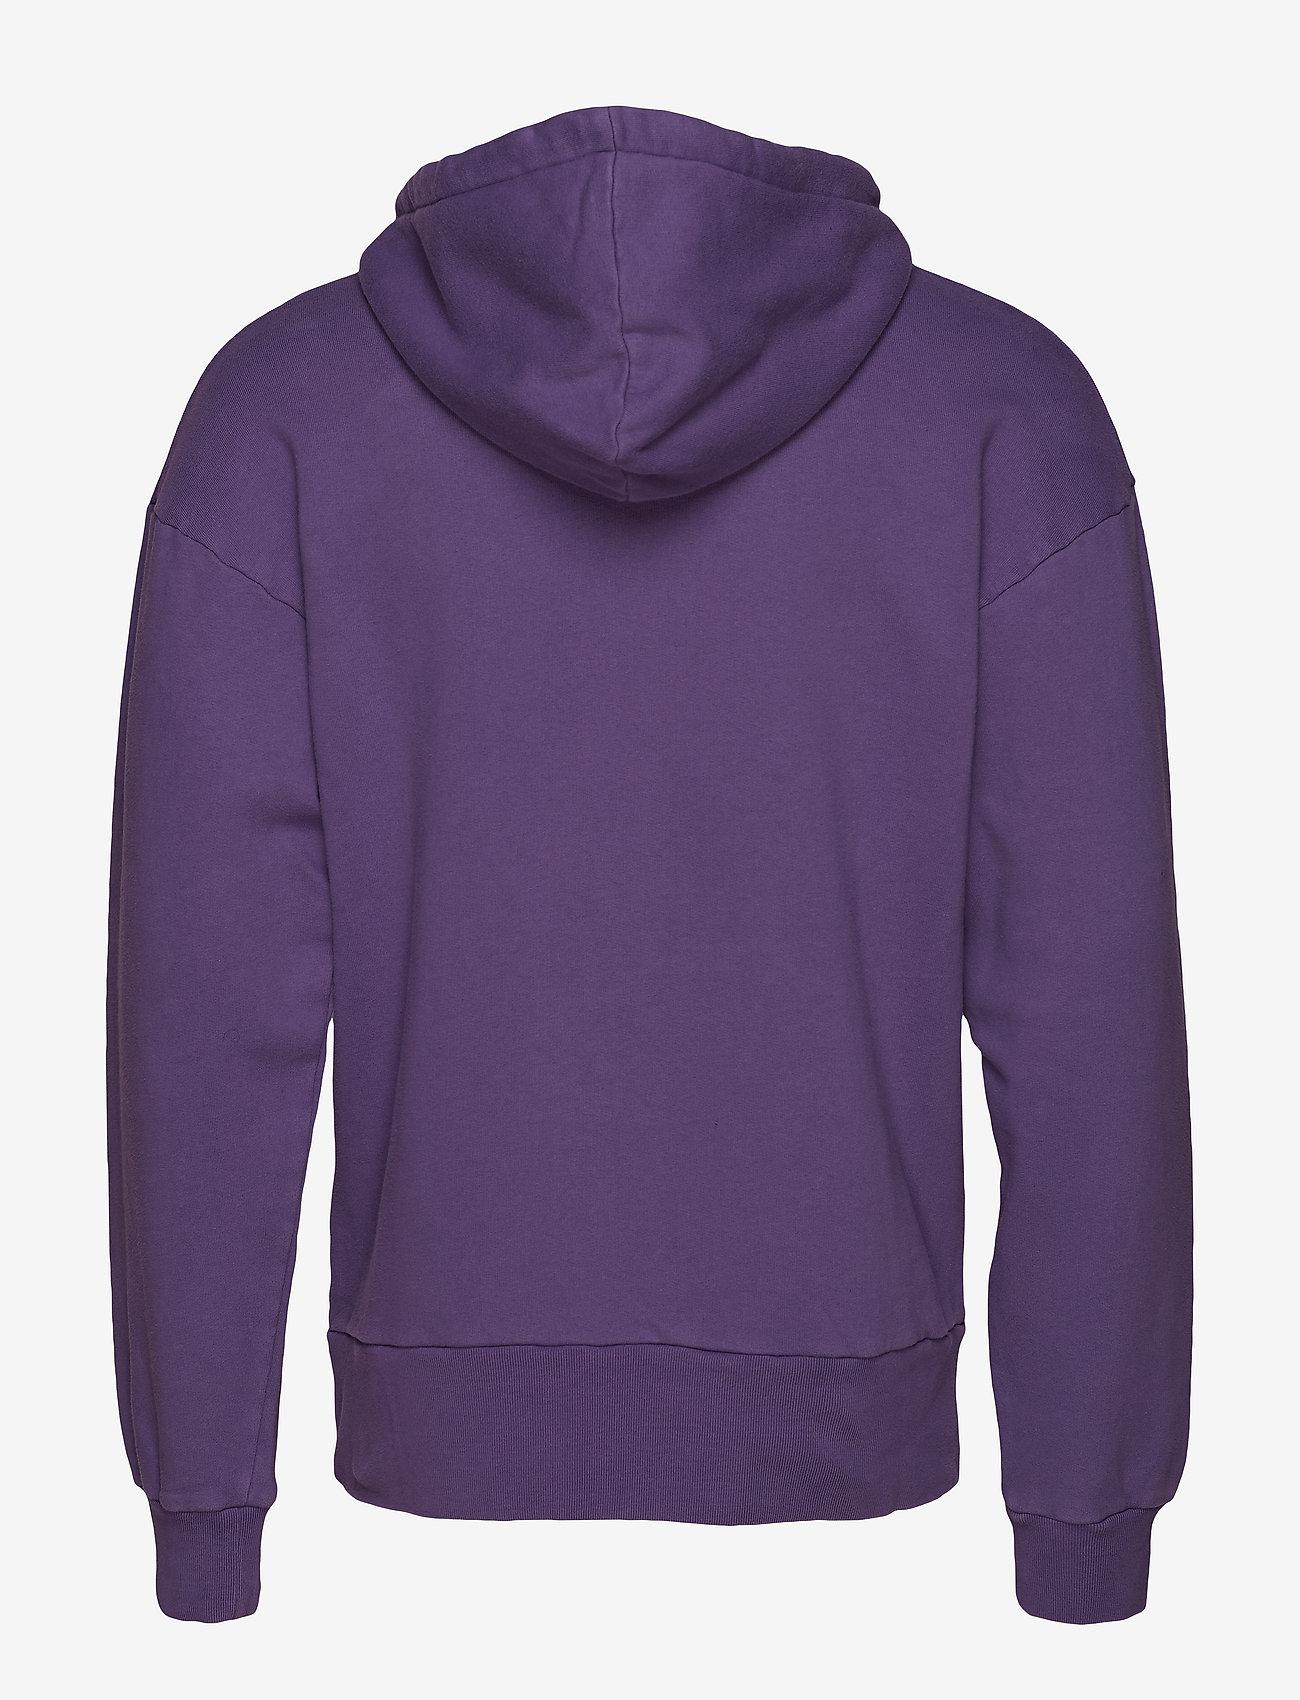 Bulky Hoodie (Faded Purple) - HAN Kjøbenhavn S7qEeL